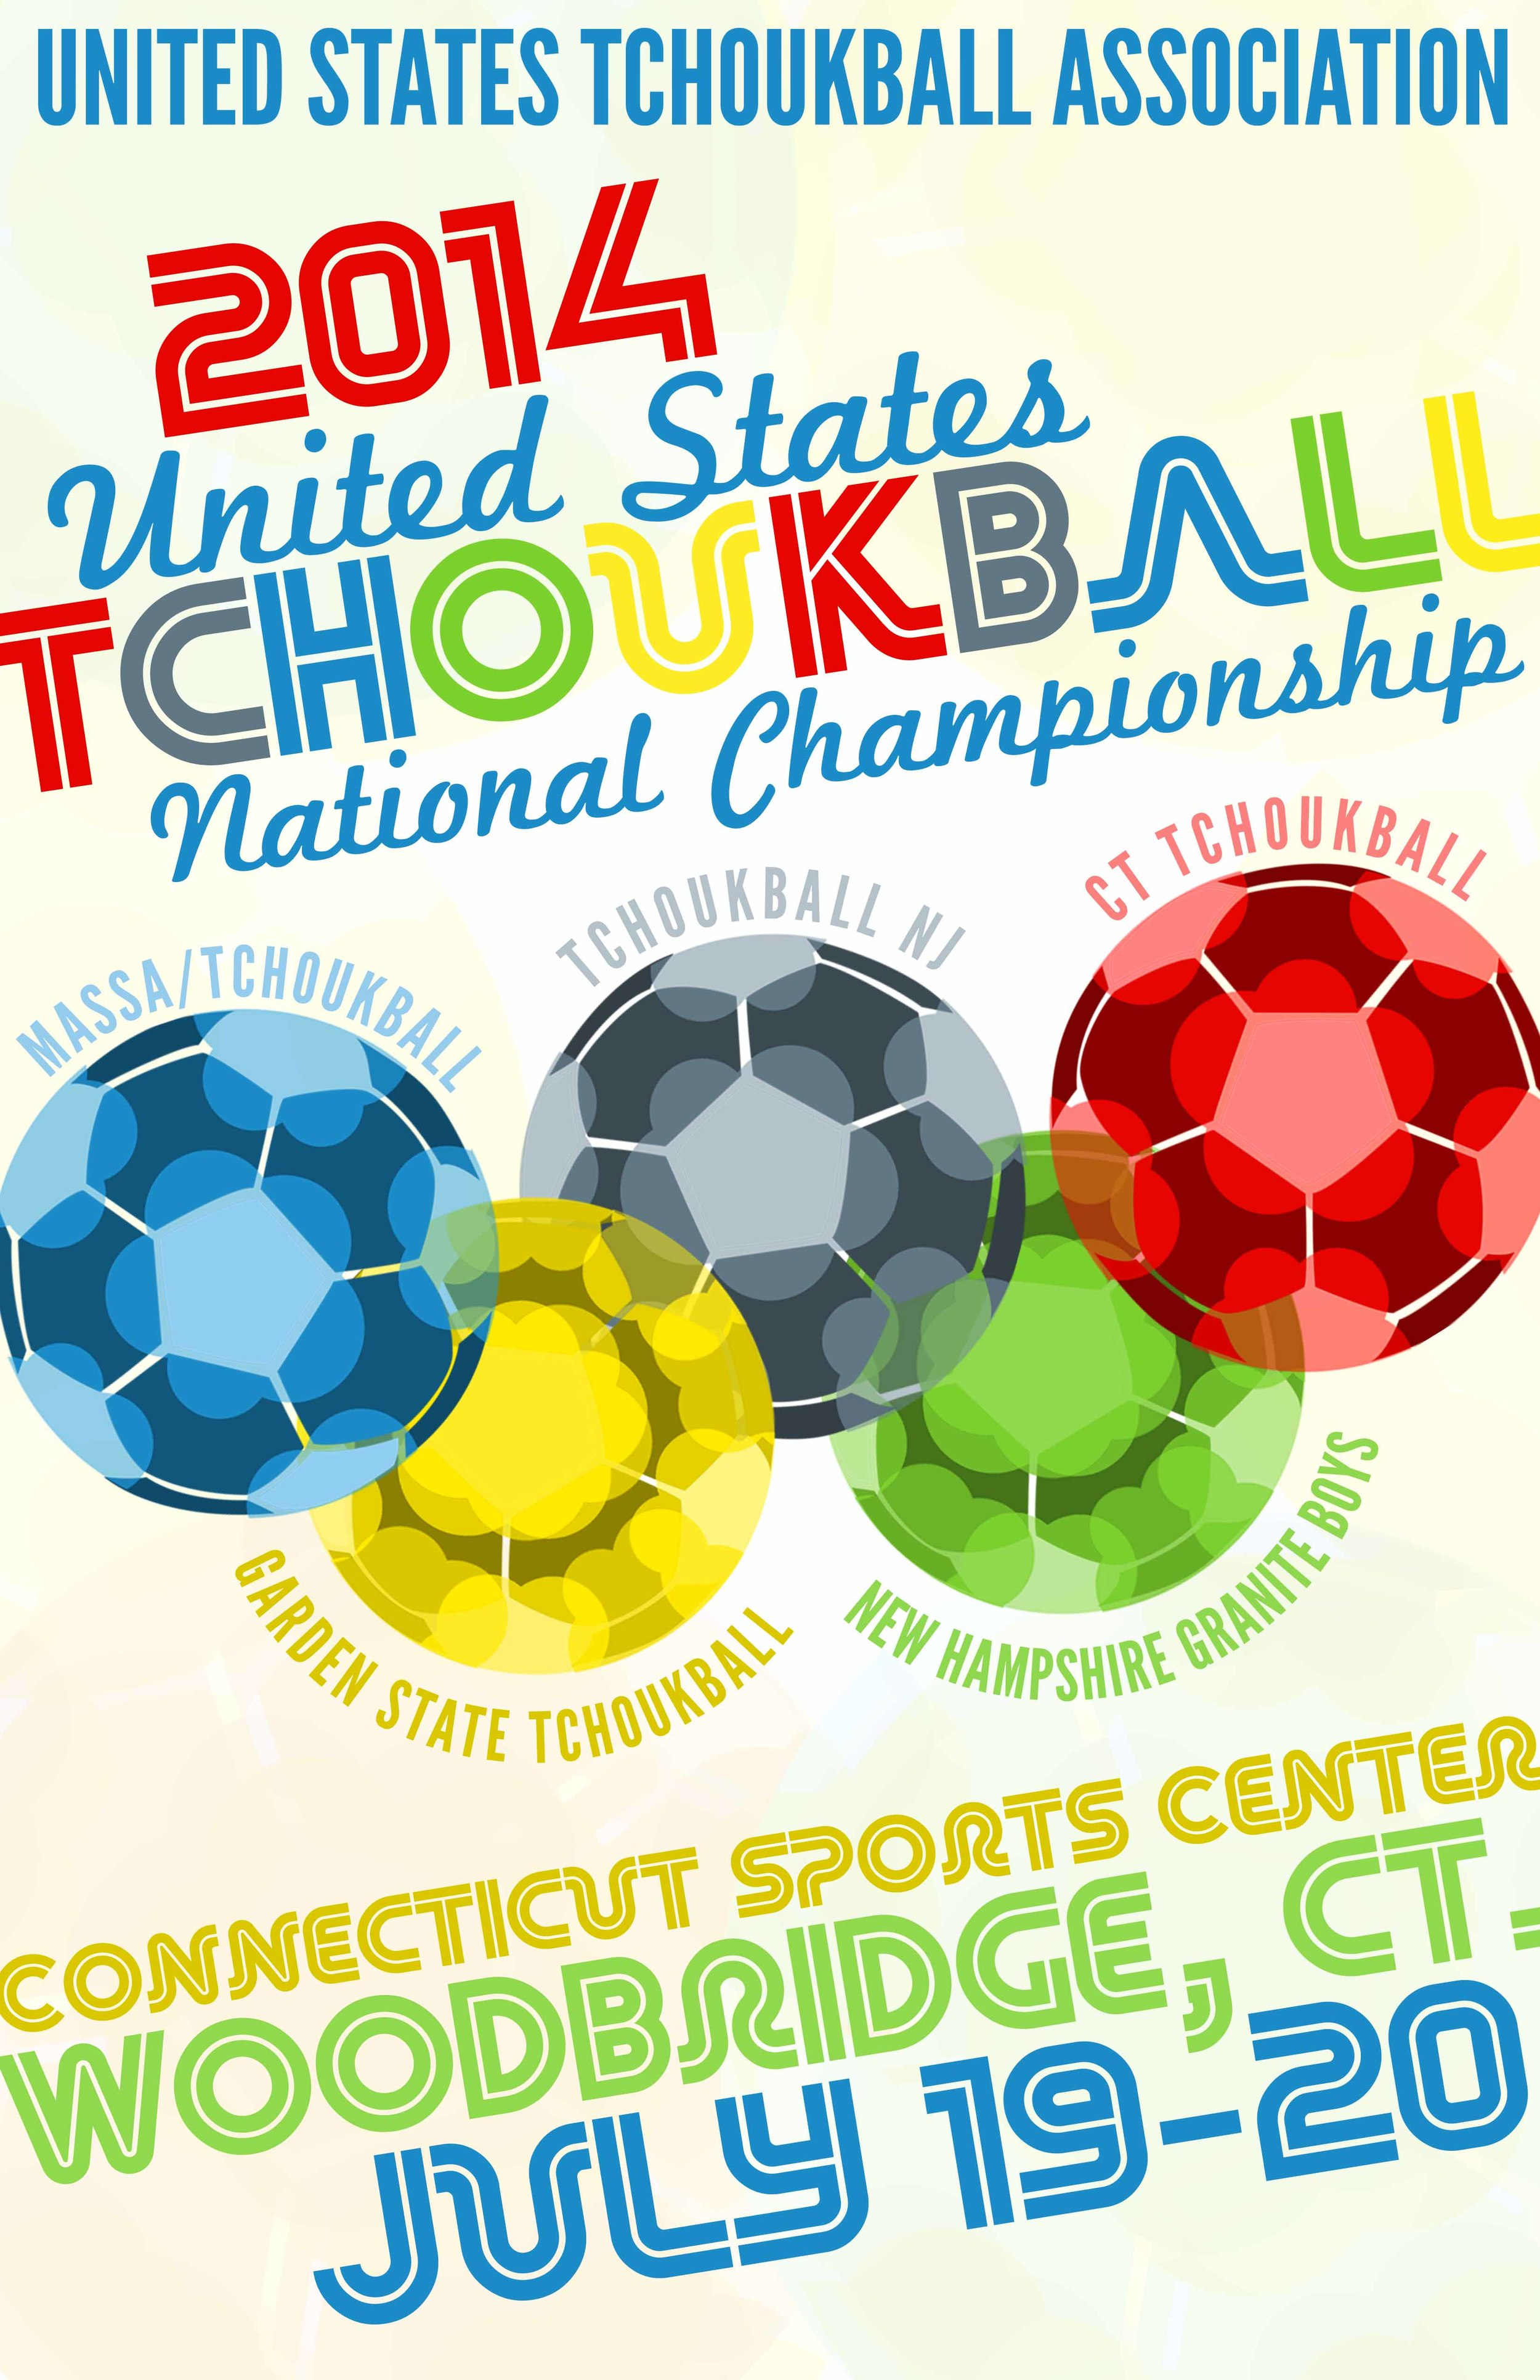 2014 USTBA National Championship - July 19-20 Woodbridge, CT